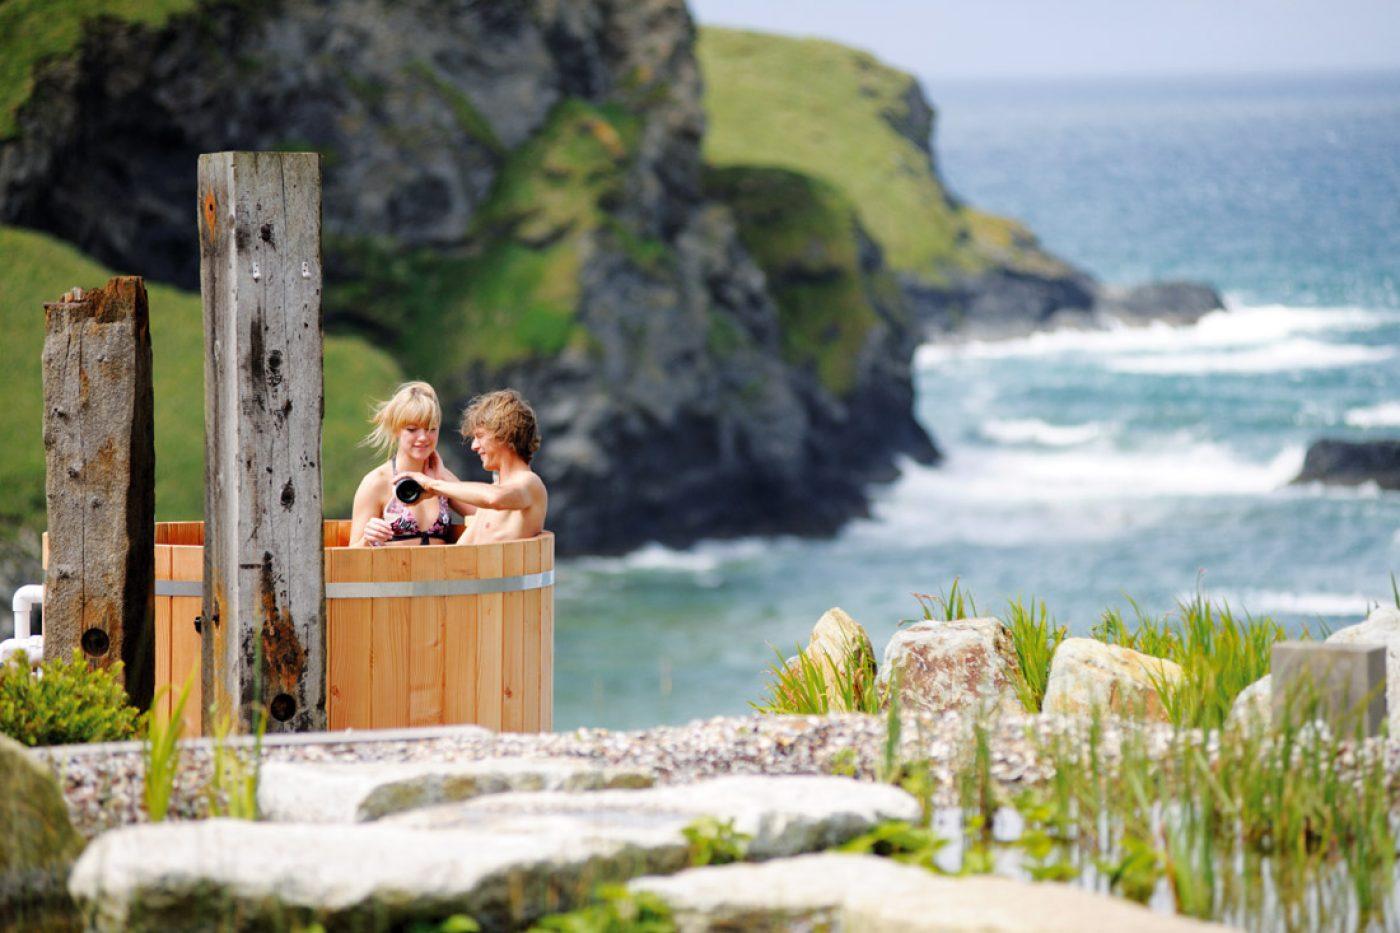 The Scarlet hot tub - Coastal retreats